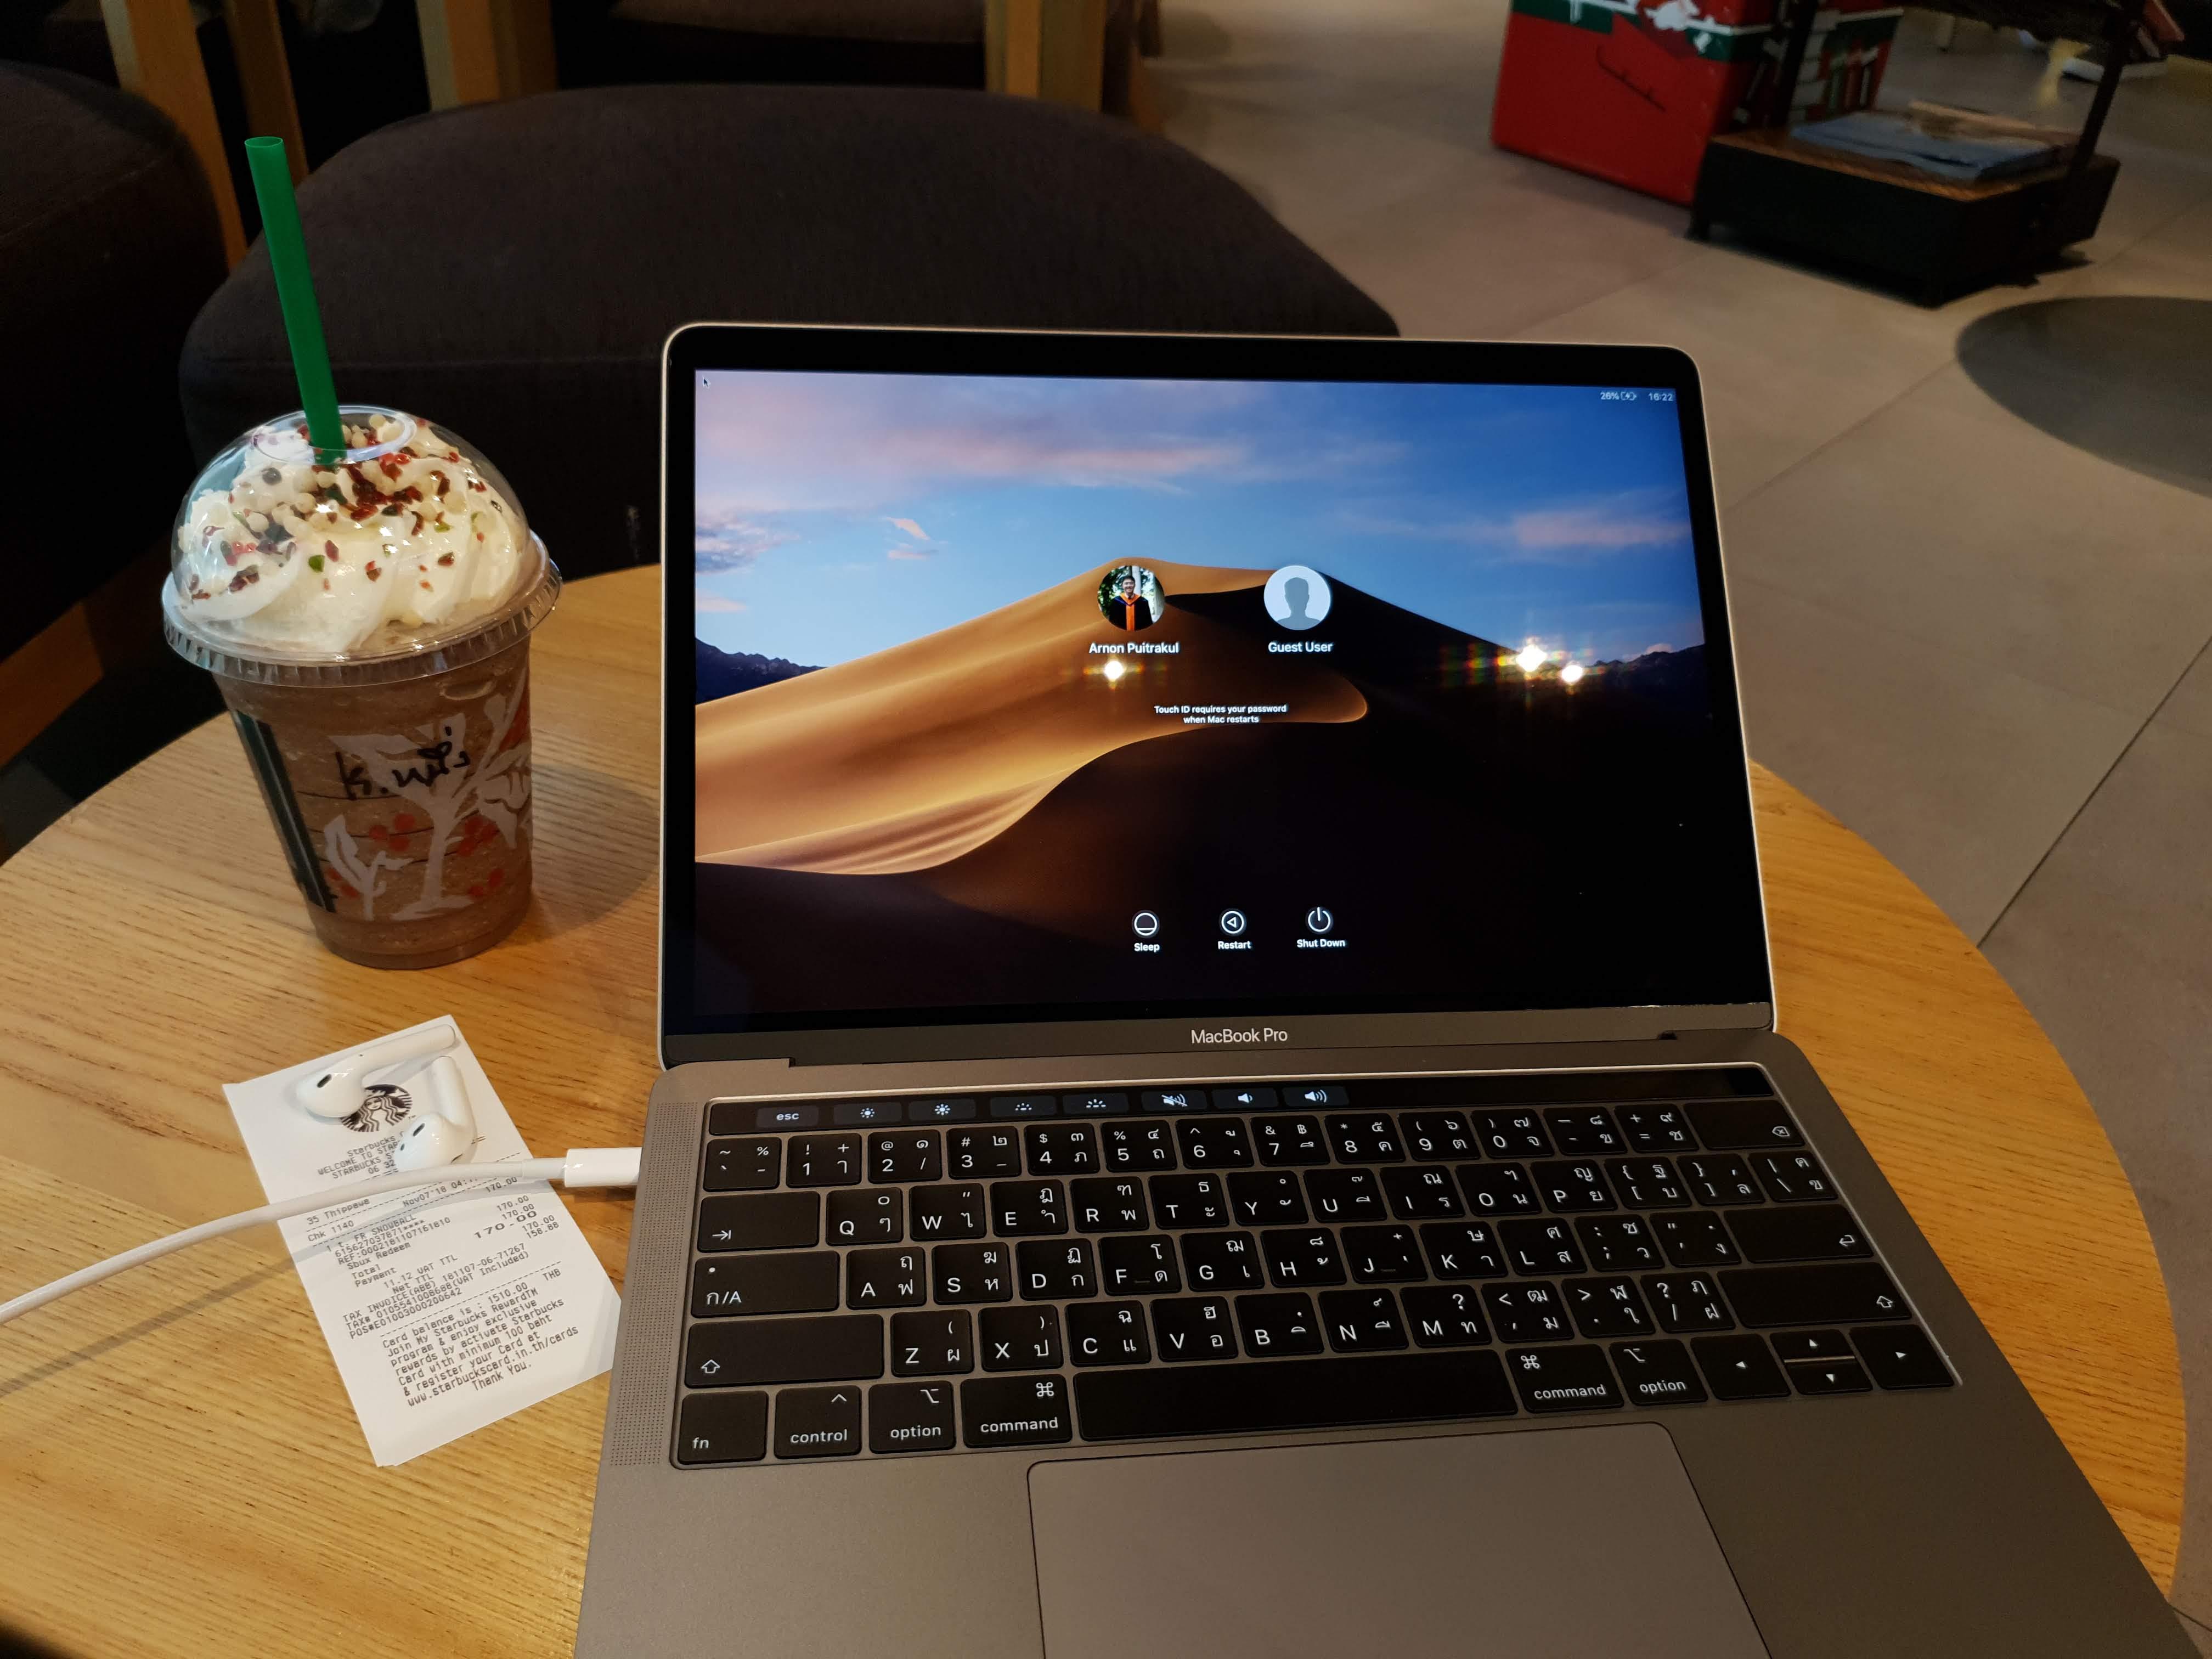 MacBook Pro 13-inch 2018 with Starbucks